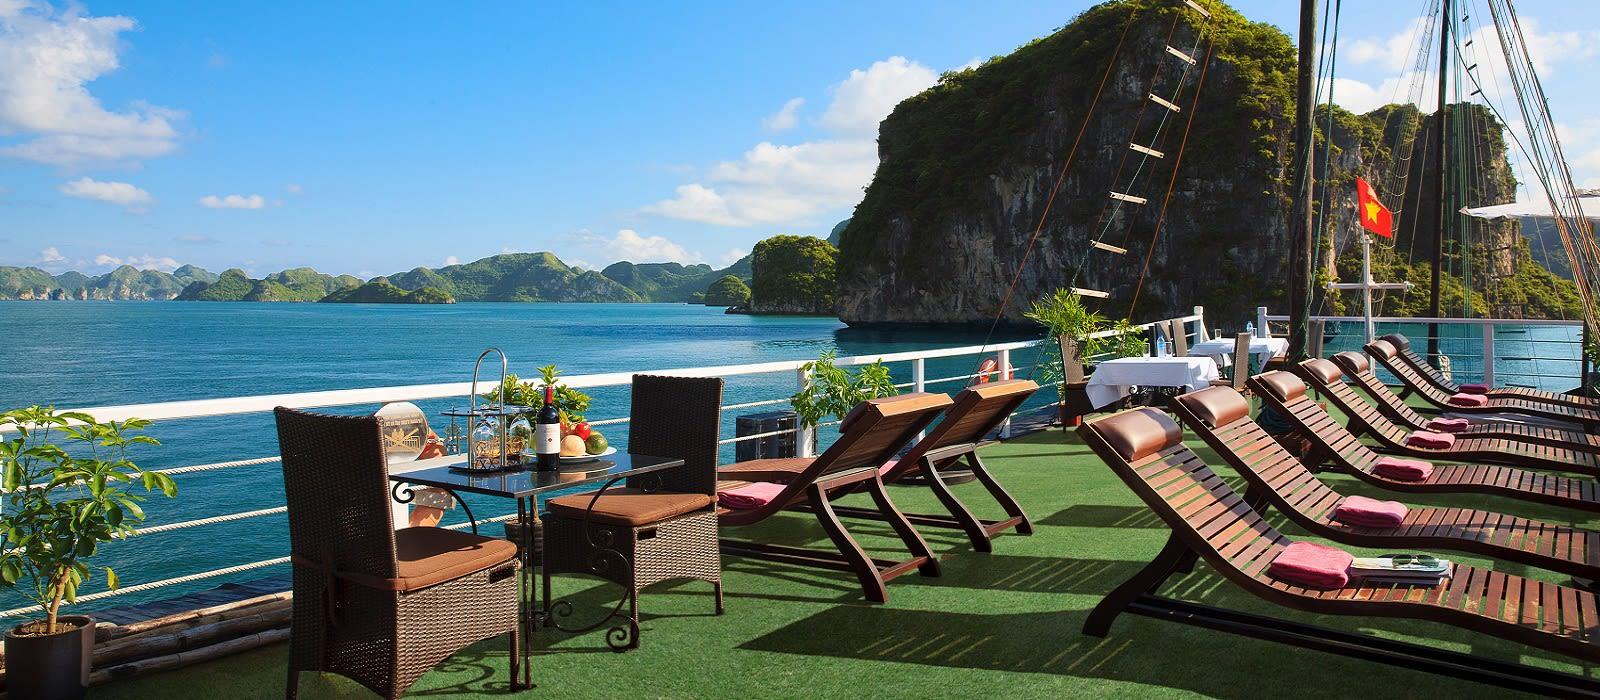 Hotel Carina Cruise Halong Bay Vietnam